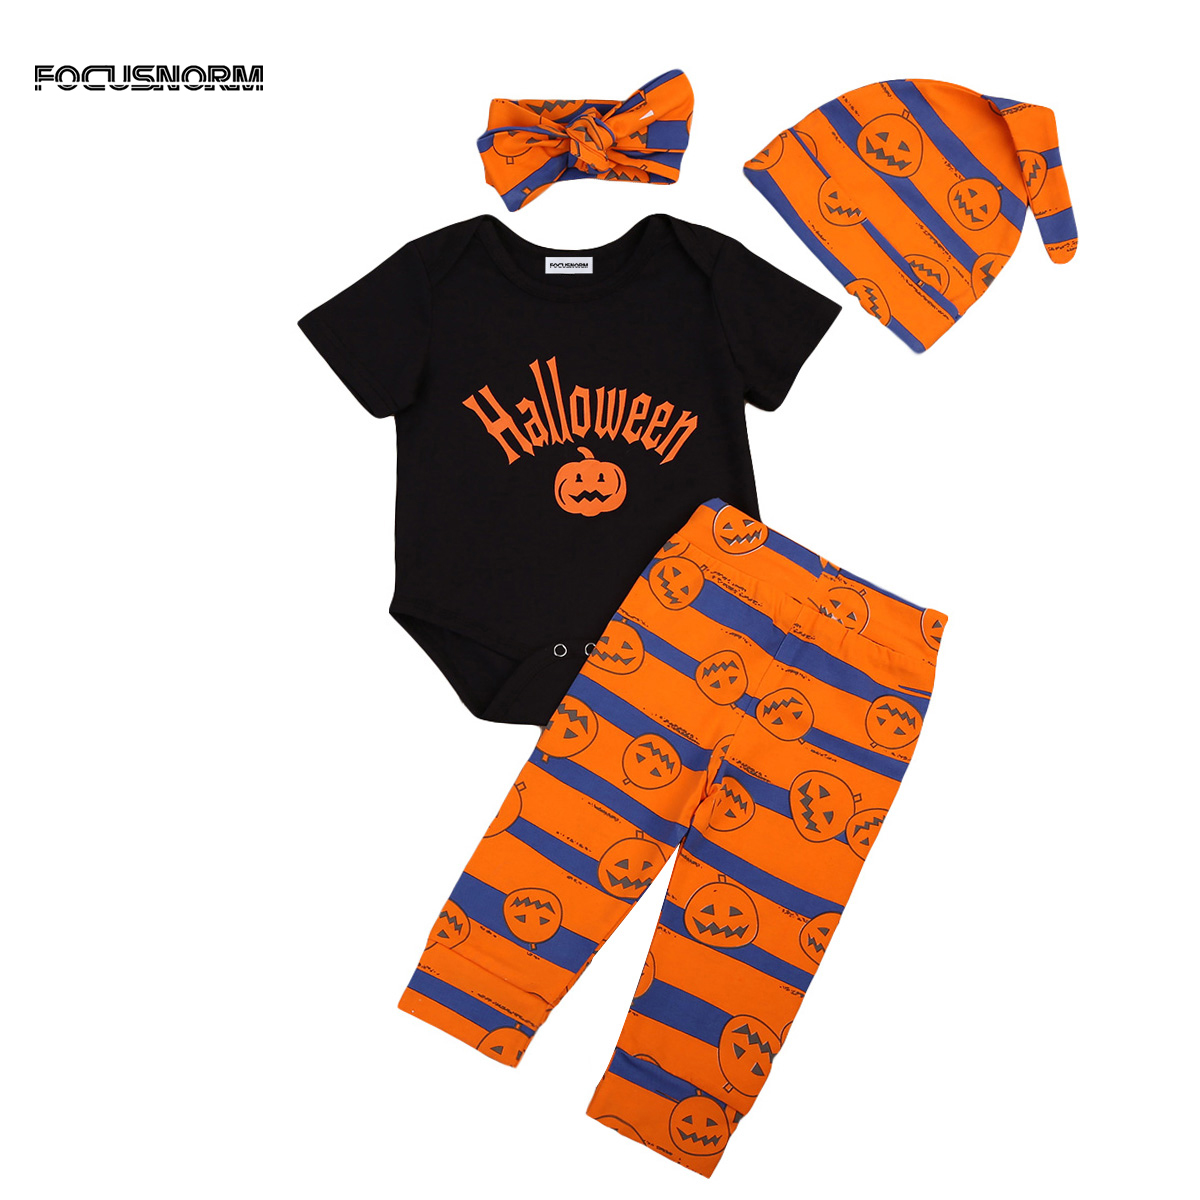 Halloween Newborn Baby Boy Girl Clothes Tops Short Sleeve Romper Pumpkins Stripes Pants Hat 4pcs Outfits Set